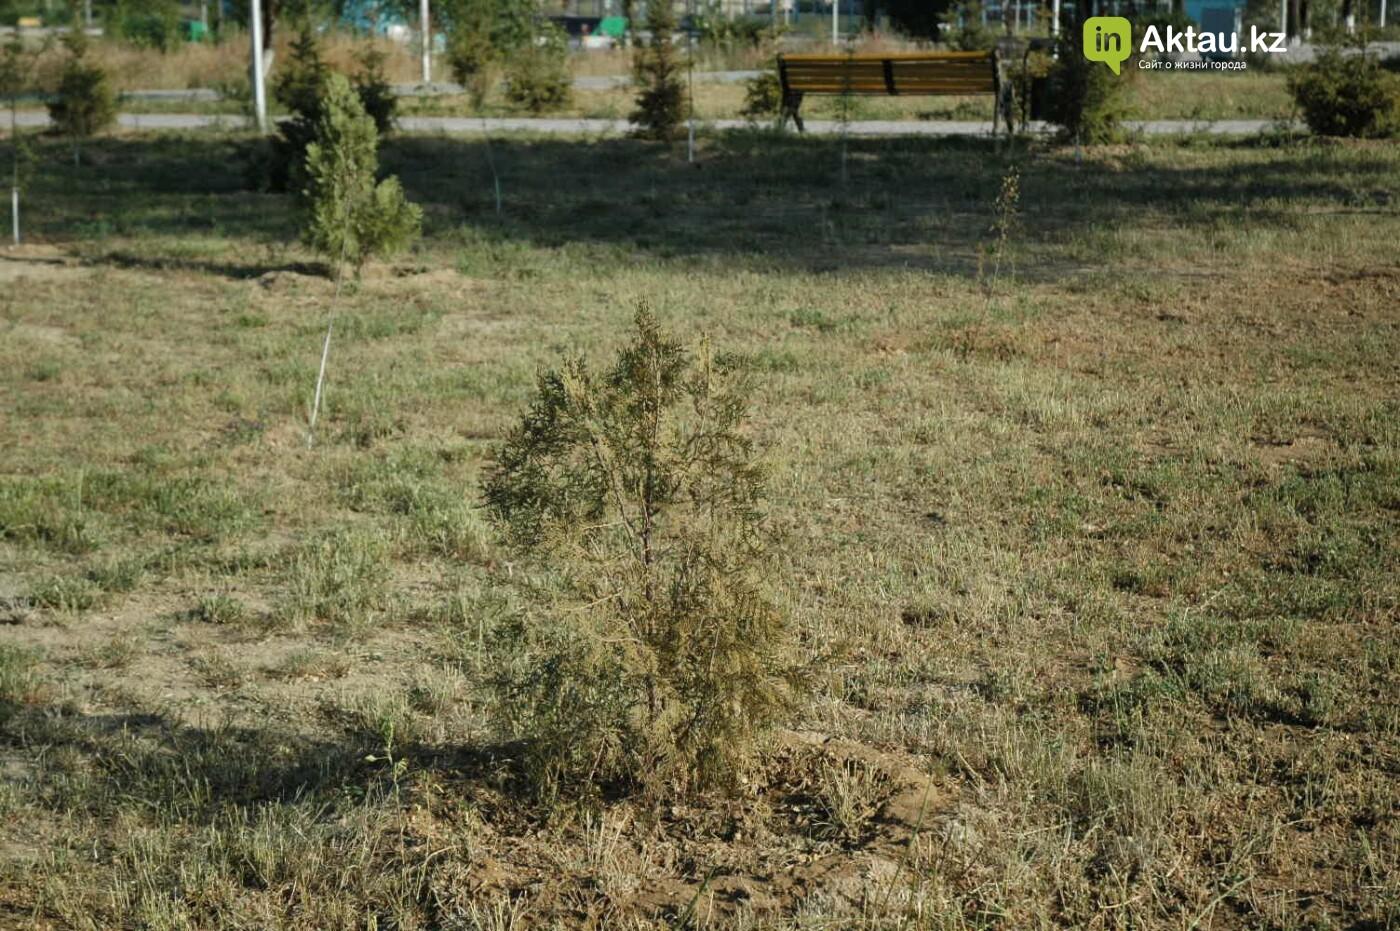 Погибшие от засухи и обезвоживания в Актау исчисляются десятками (ФОТО), фото-9